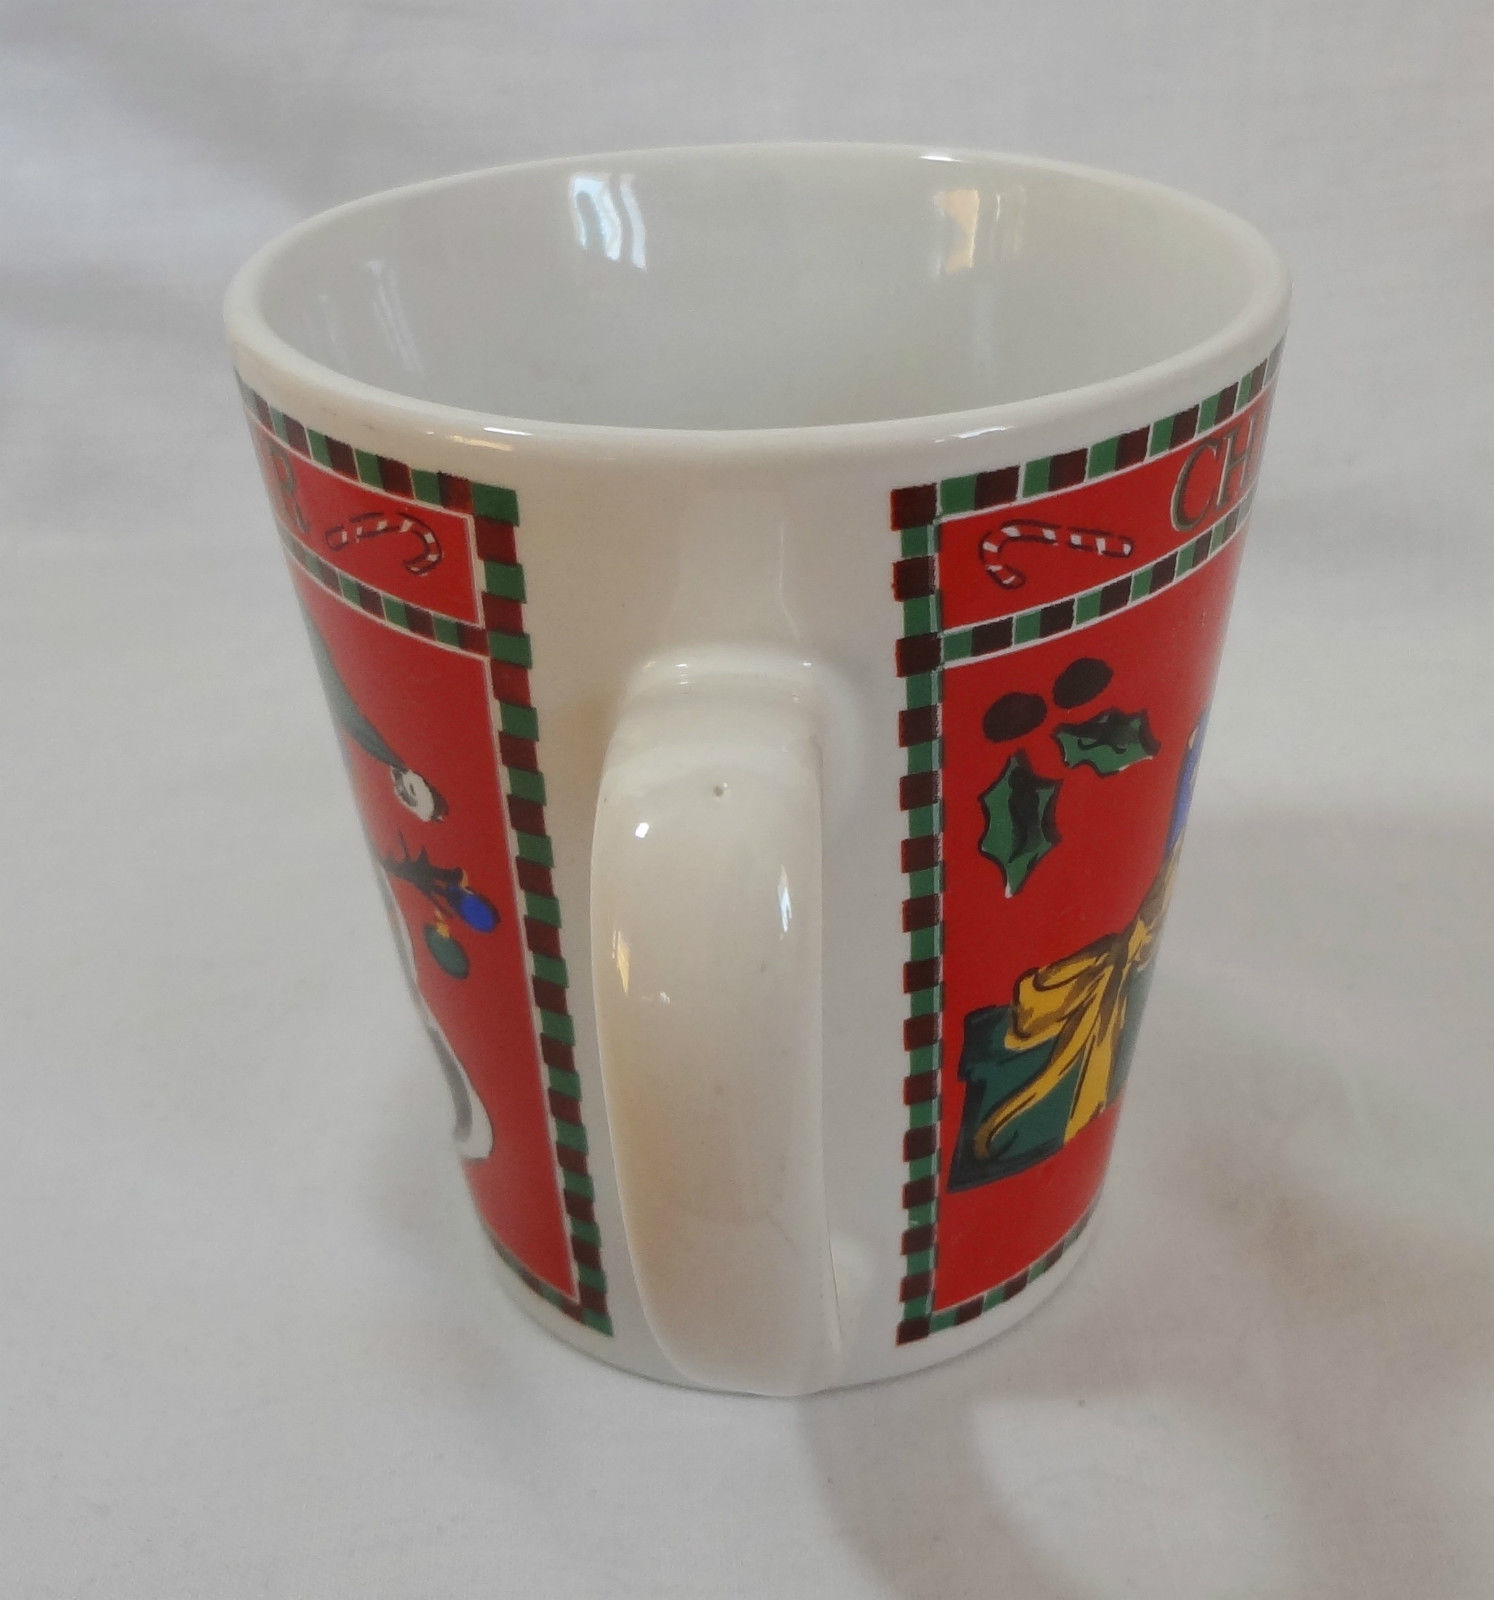 Christmas Cheer Snowman Mitt Hat Skate Gifts 10 Oz. Coffee Mug Cup